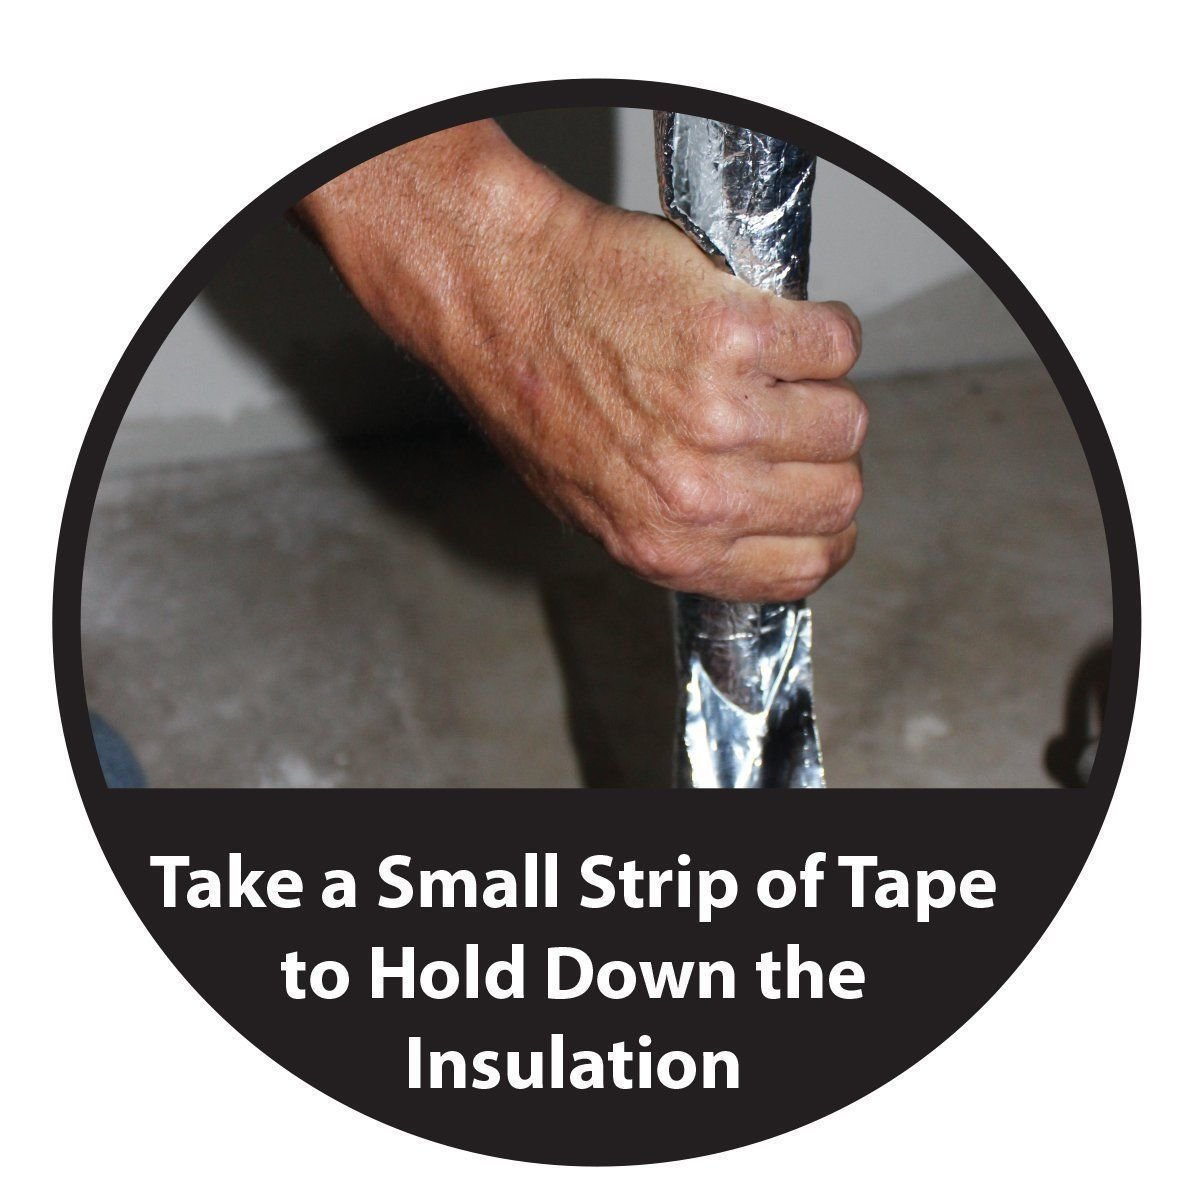 MWS Pipe Wrap Faucet Sealer Insulation Kit Foam Core Weatherization 6'' x 25' Tape